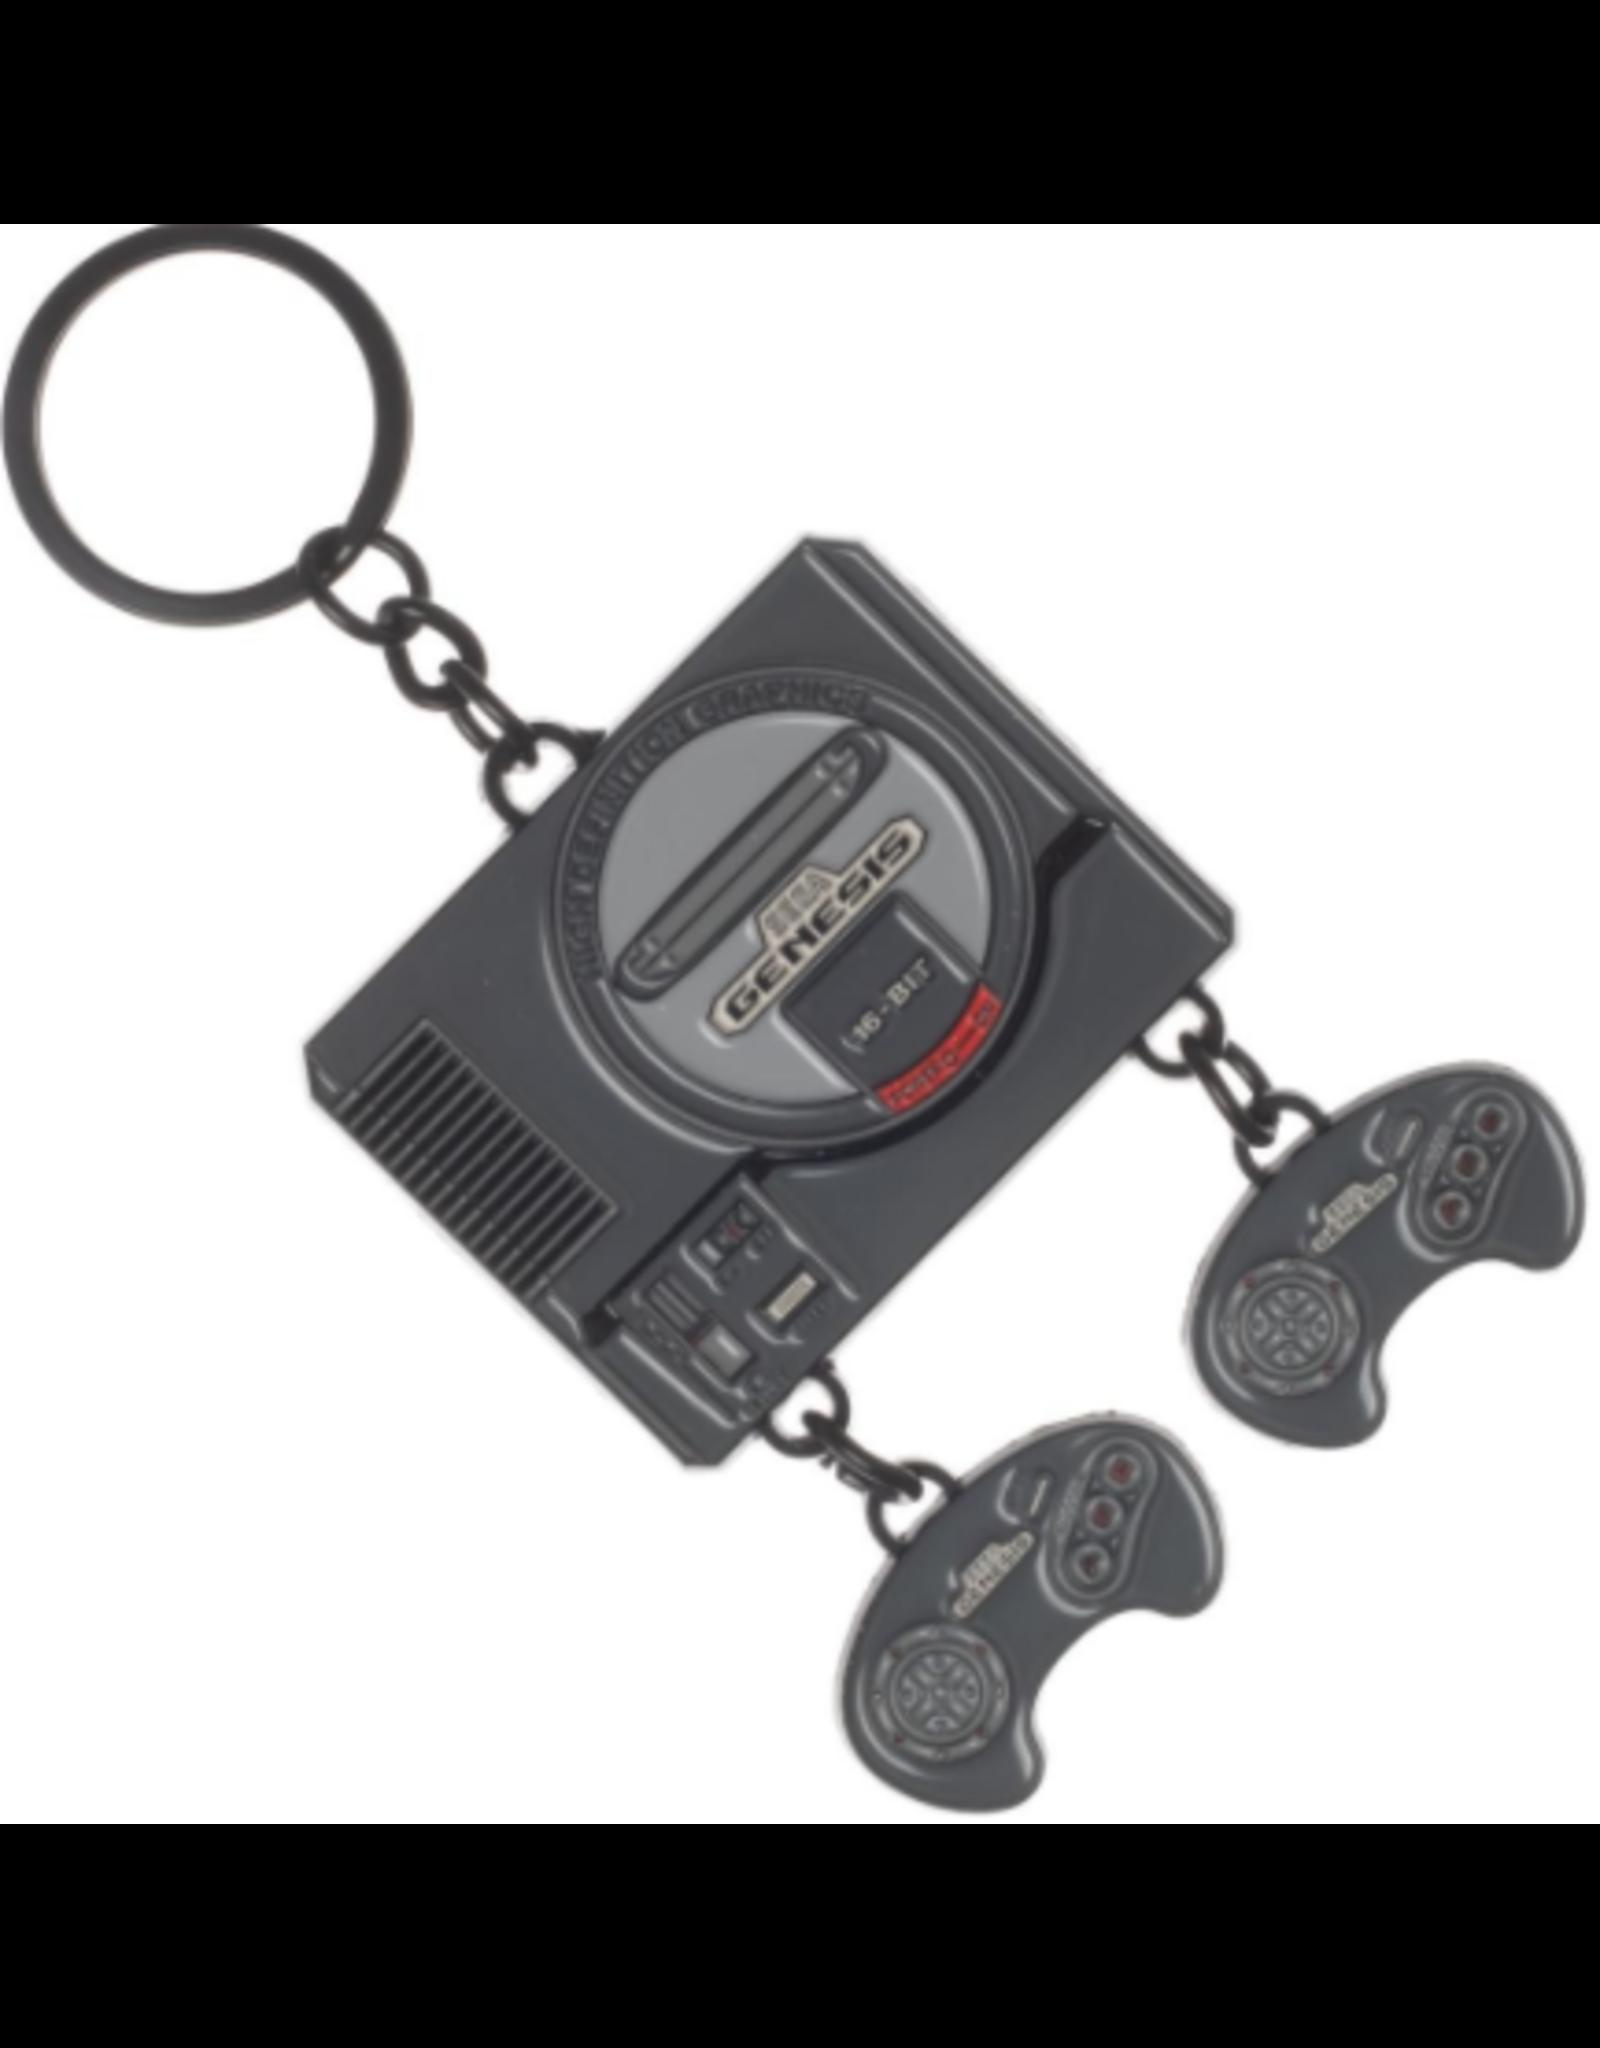 Bioworld Sega Genesis Keychain